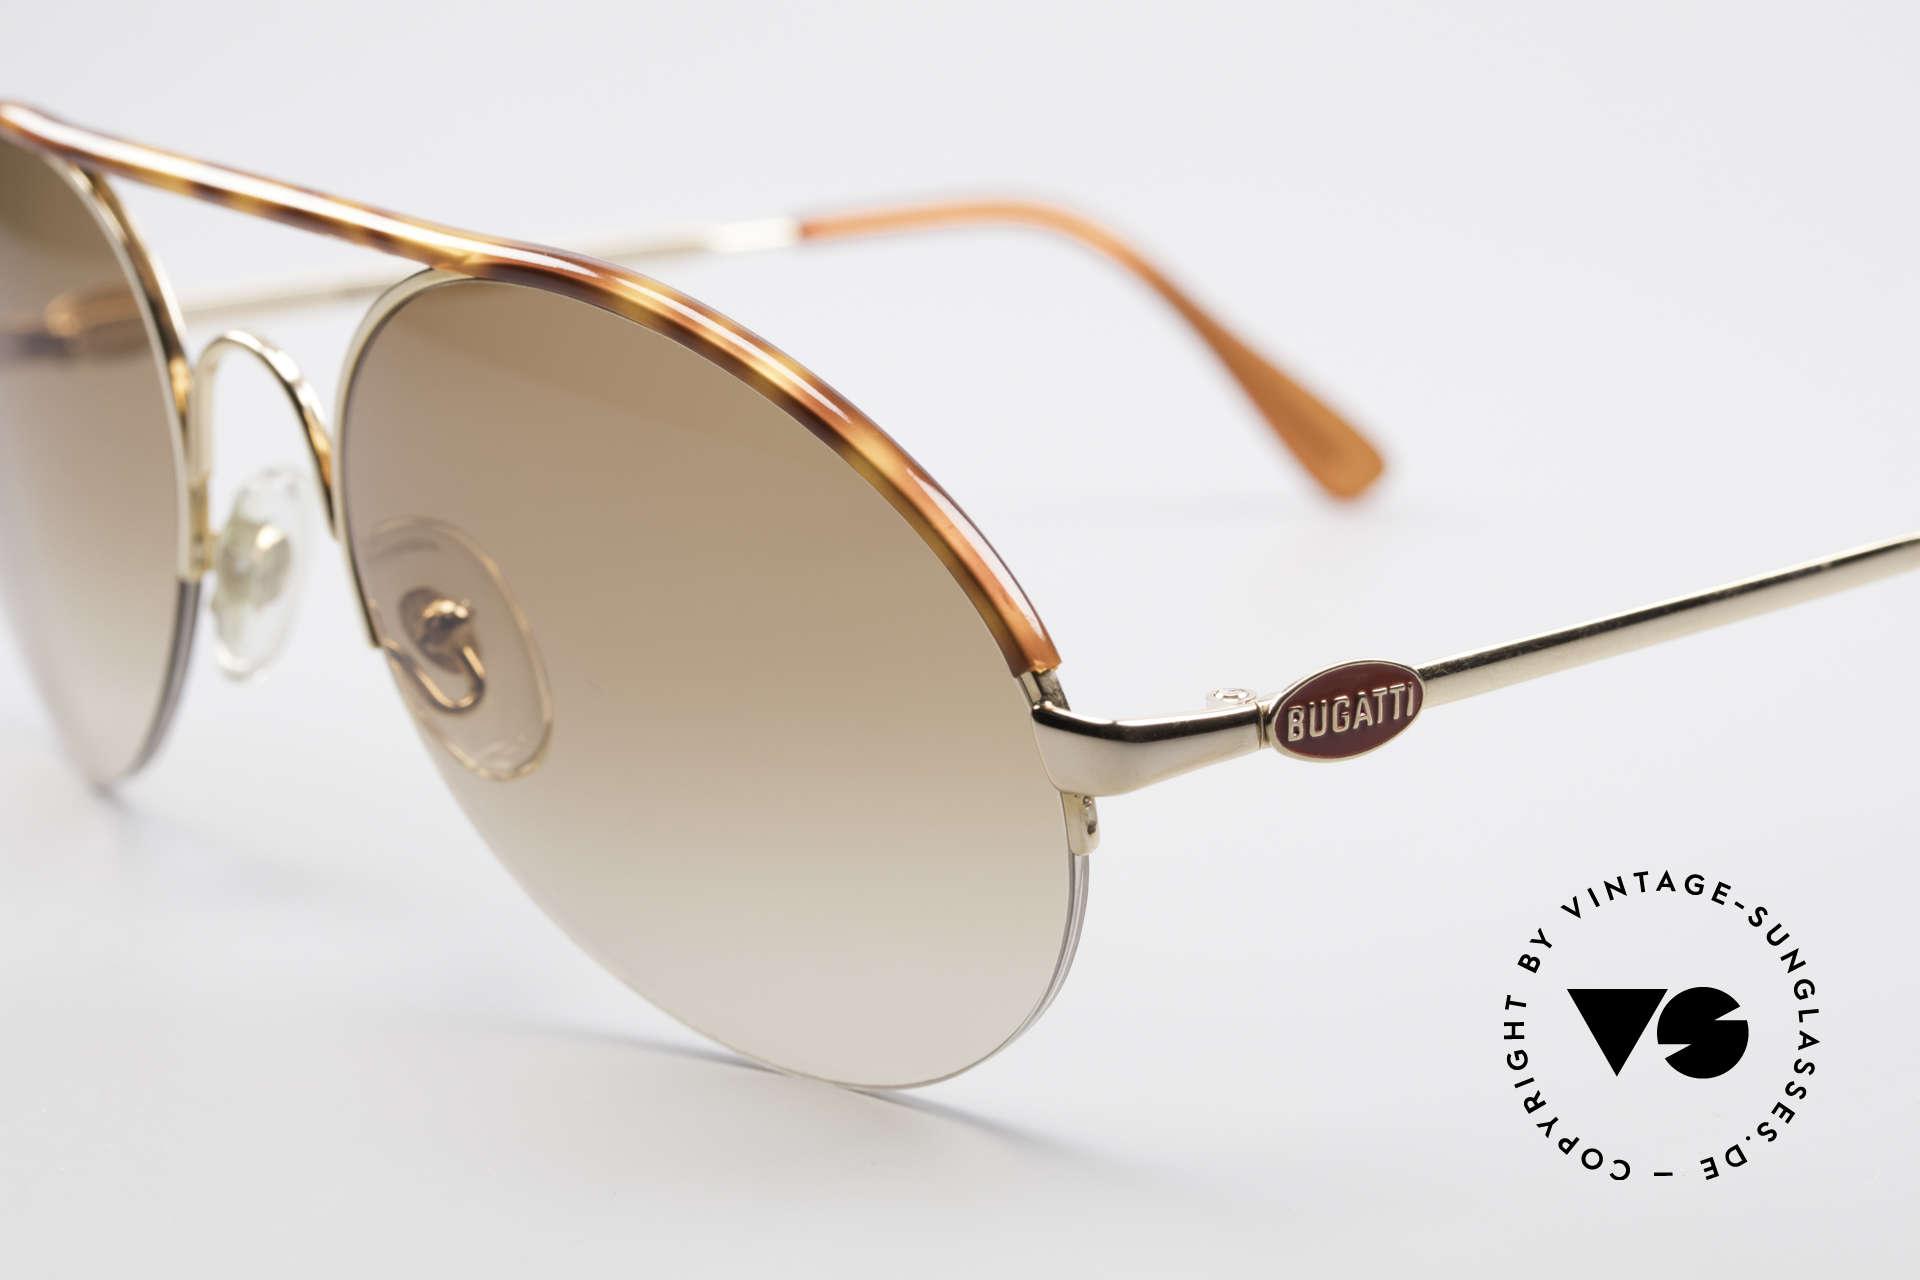 Bugatti 64919 Halb Rahmenlose Sonnenbrille, ungetragen (wie alle unsere Bugatti Sonnenbrillen), Passend für Herren